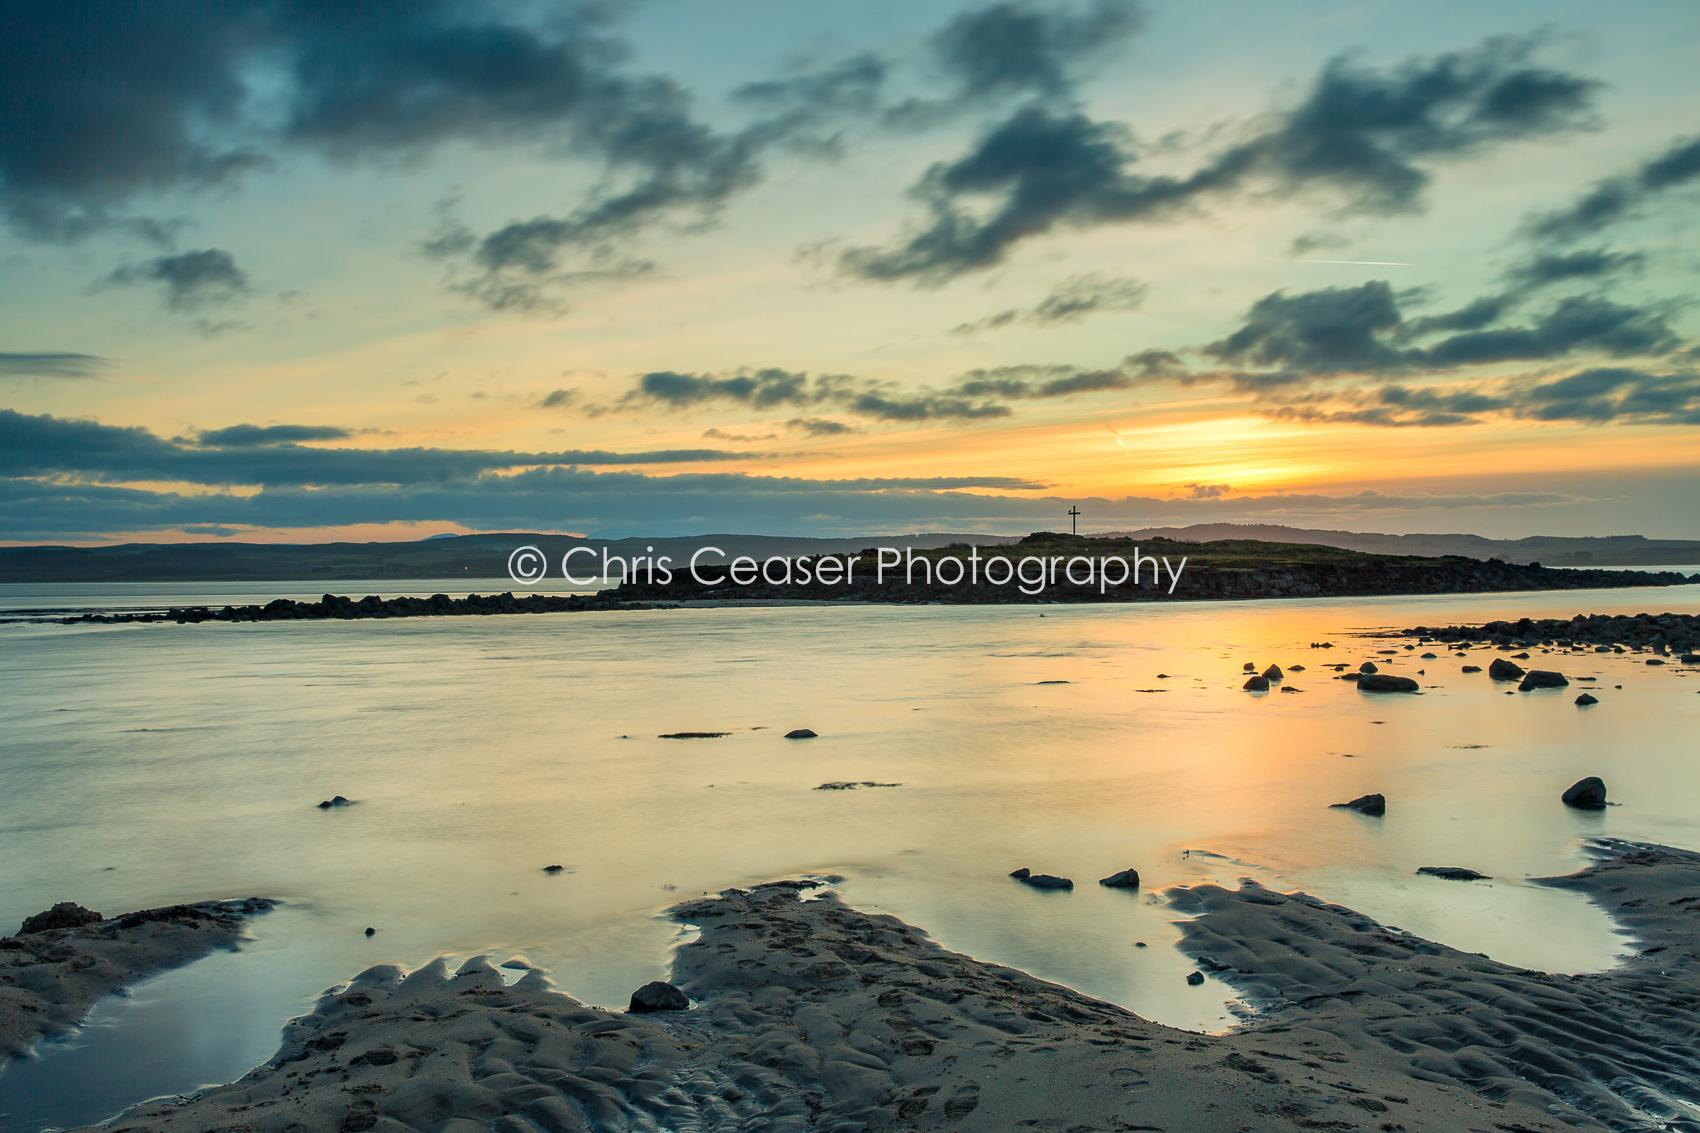 St. Cuthbert's Island, Northumberland